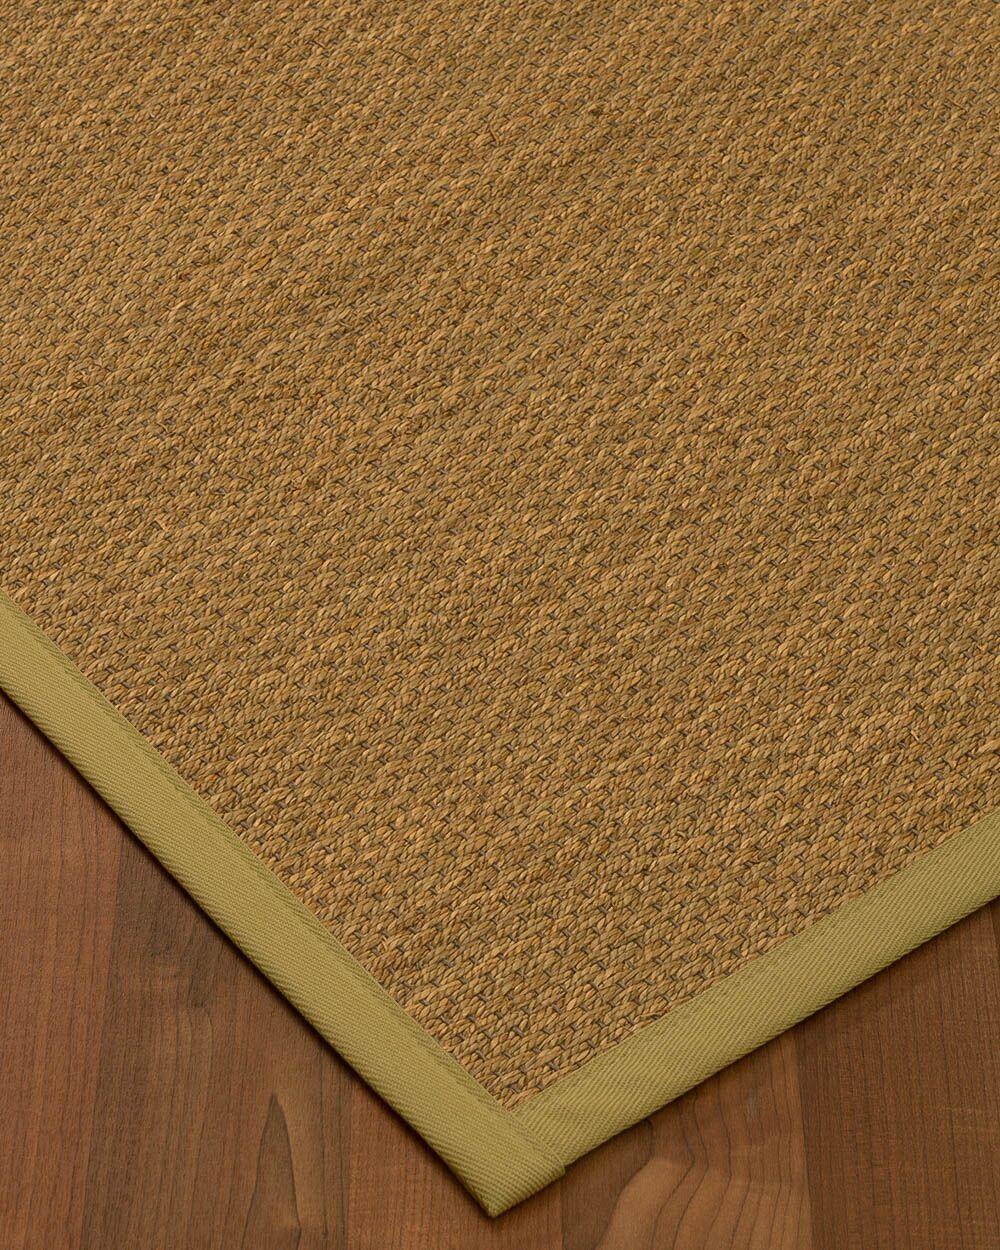 Chavis Border Hand-Woven Beige/Khaki Area Rug Rug Size: Rectangle 5' x 8', Rug Pad Included: Yes